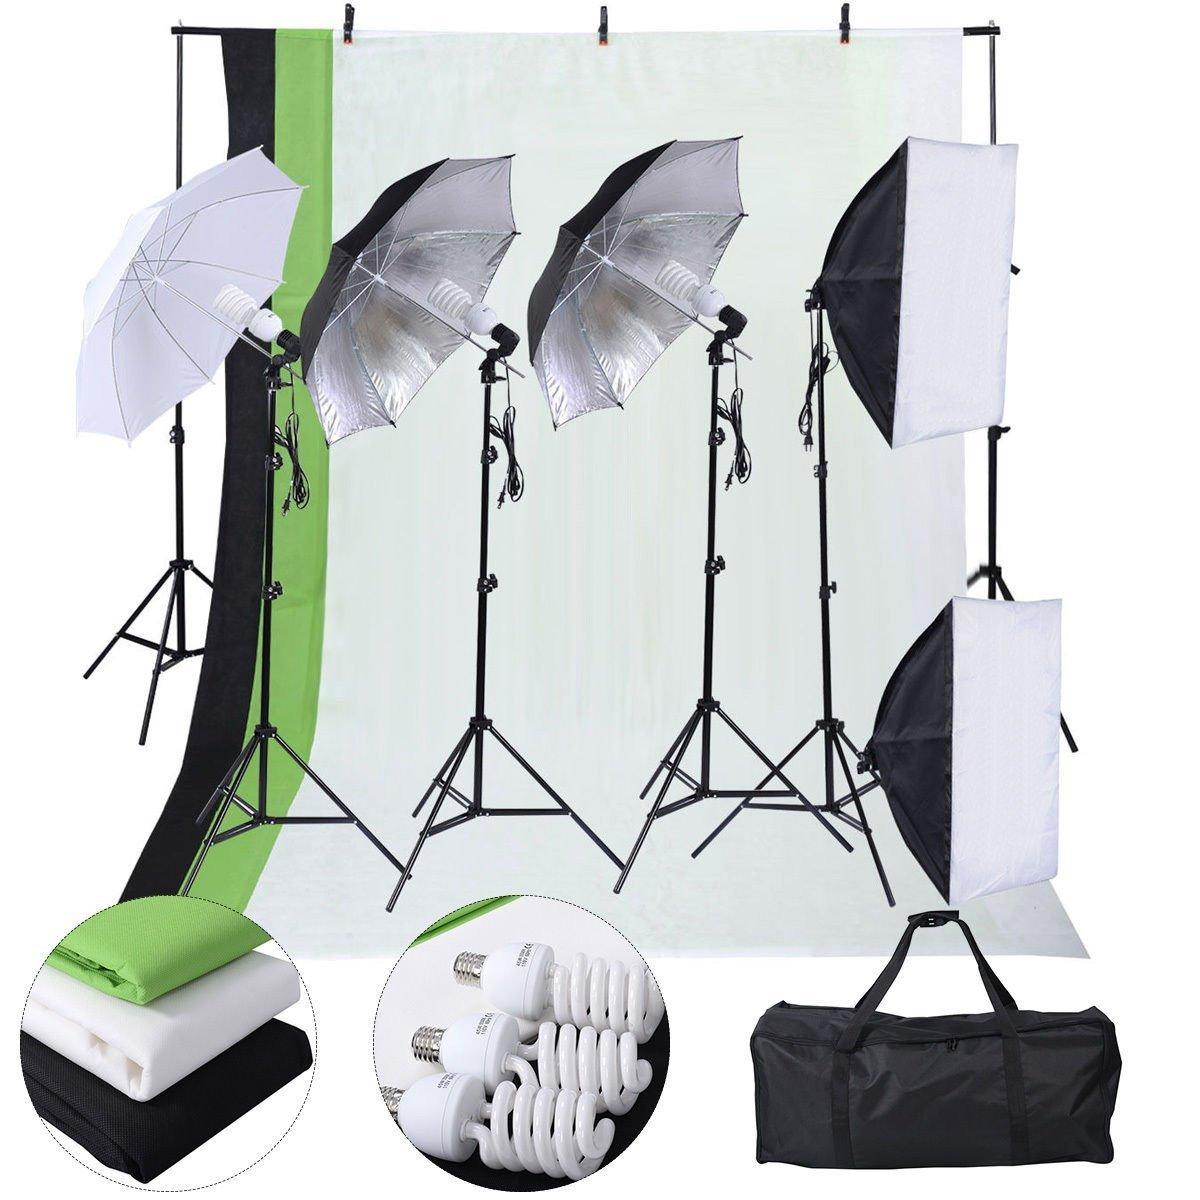 Photography Beginners Chromakey Background Backdrops Image 1